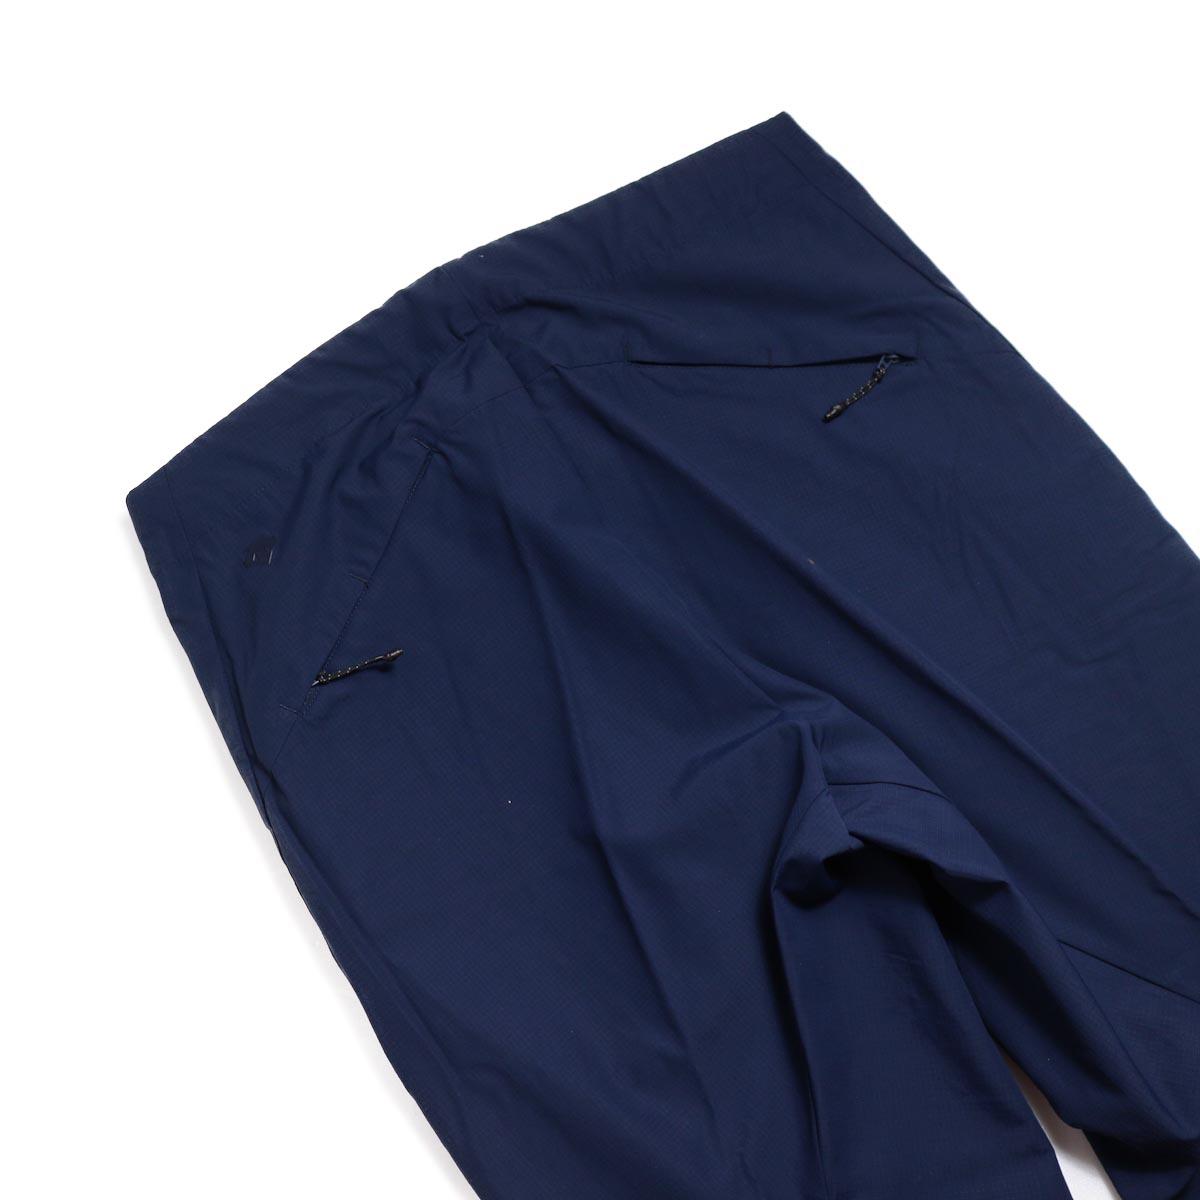 DESCENTE ddd / UNIFIT PANTS -NAVY ヒップポケット